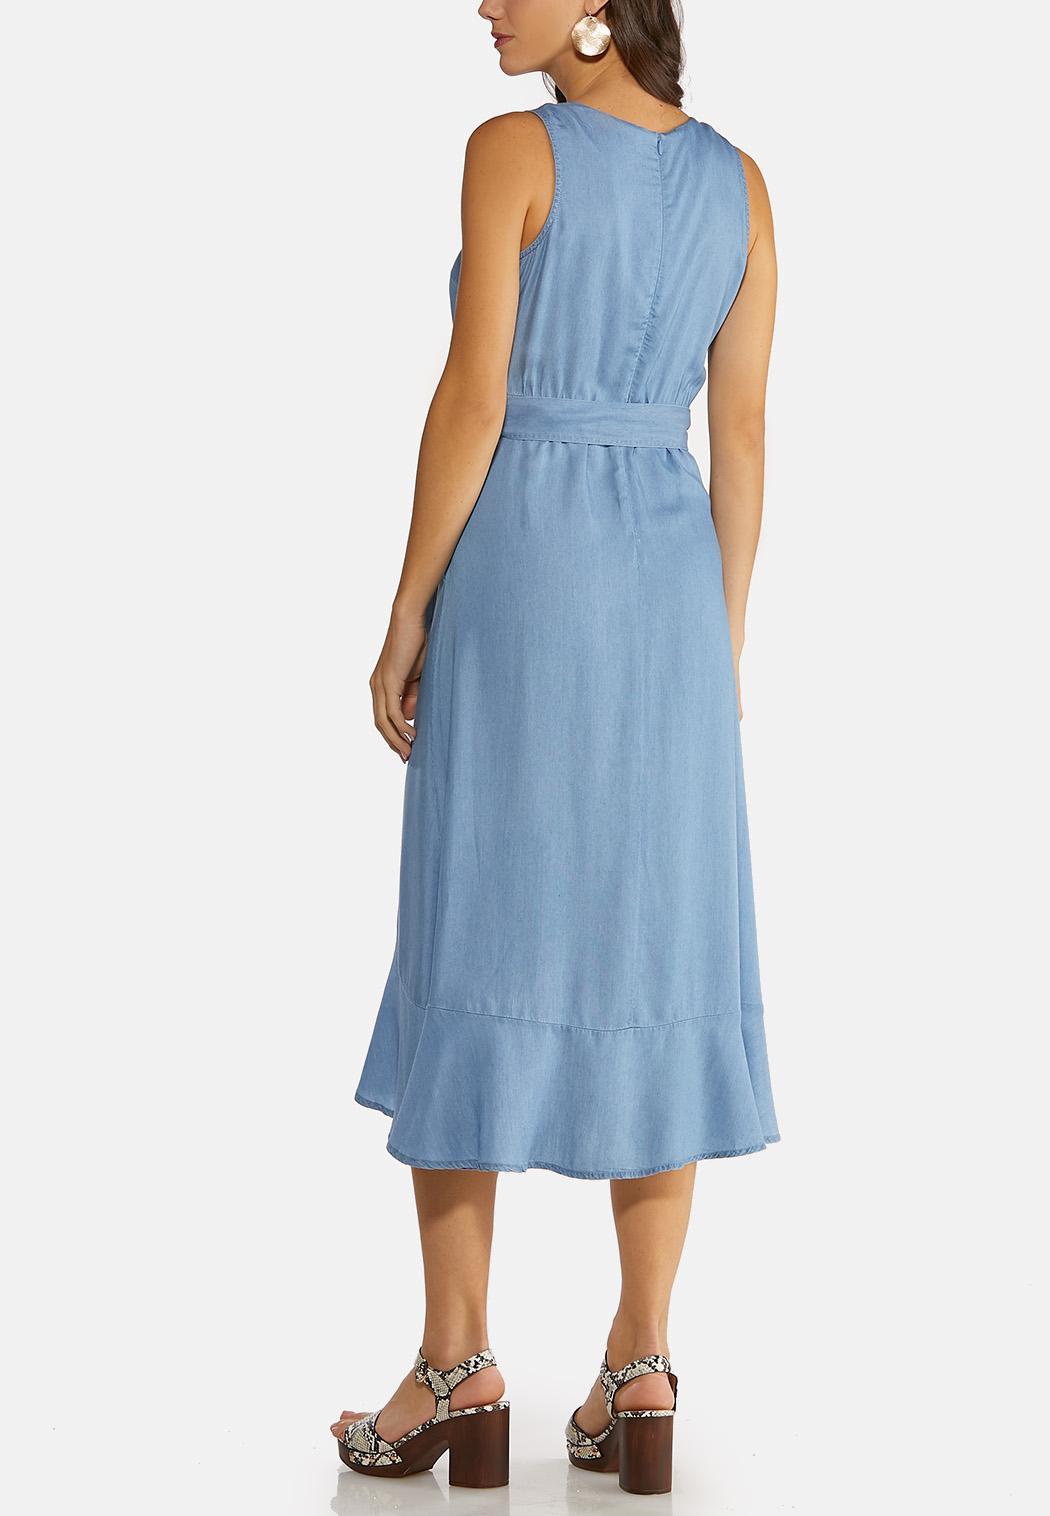 Ruffled Chambray Dress (Item #44149378)